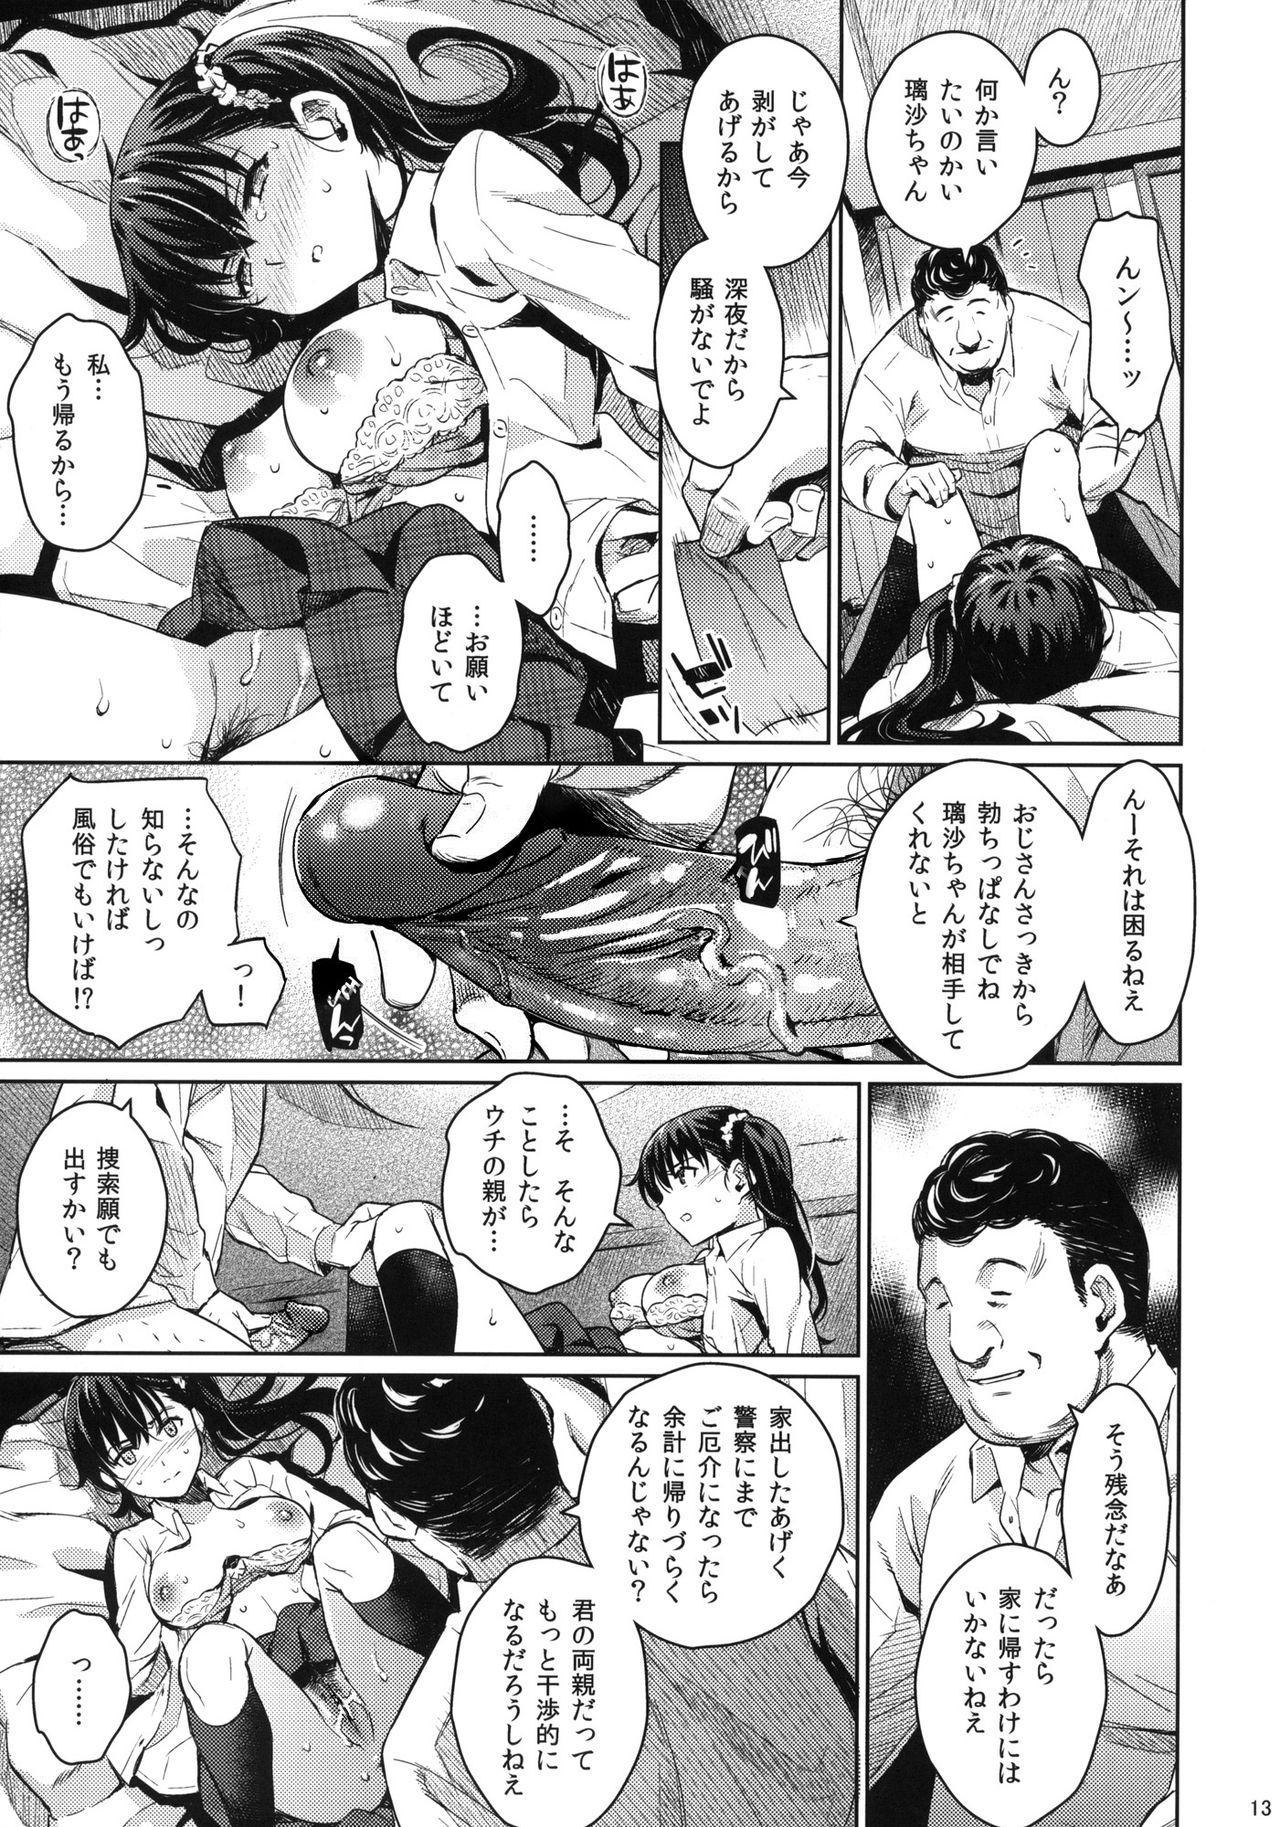 Kowaremono:Risa + Paper 11